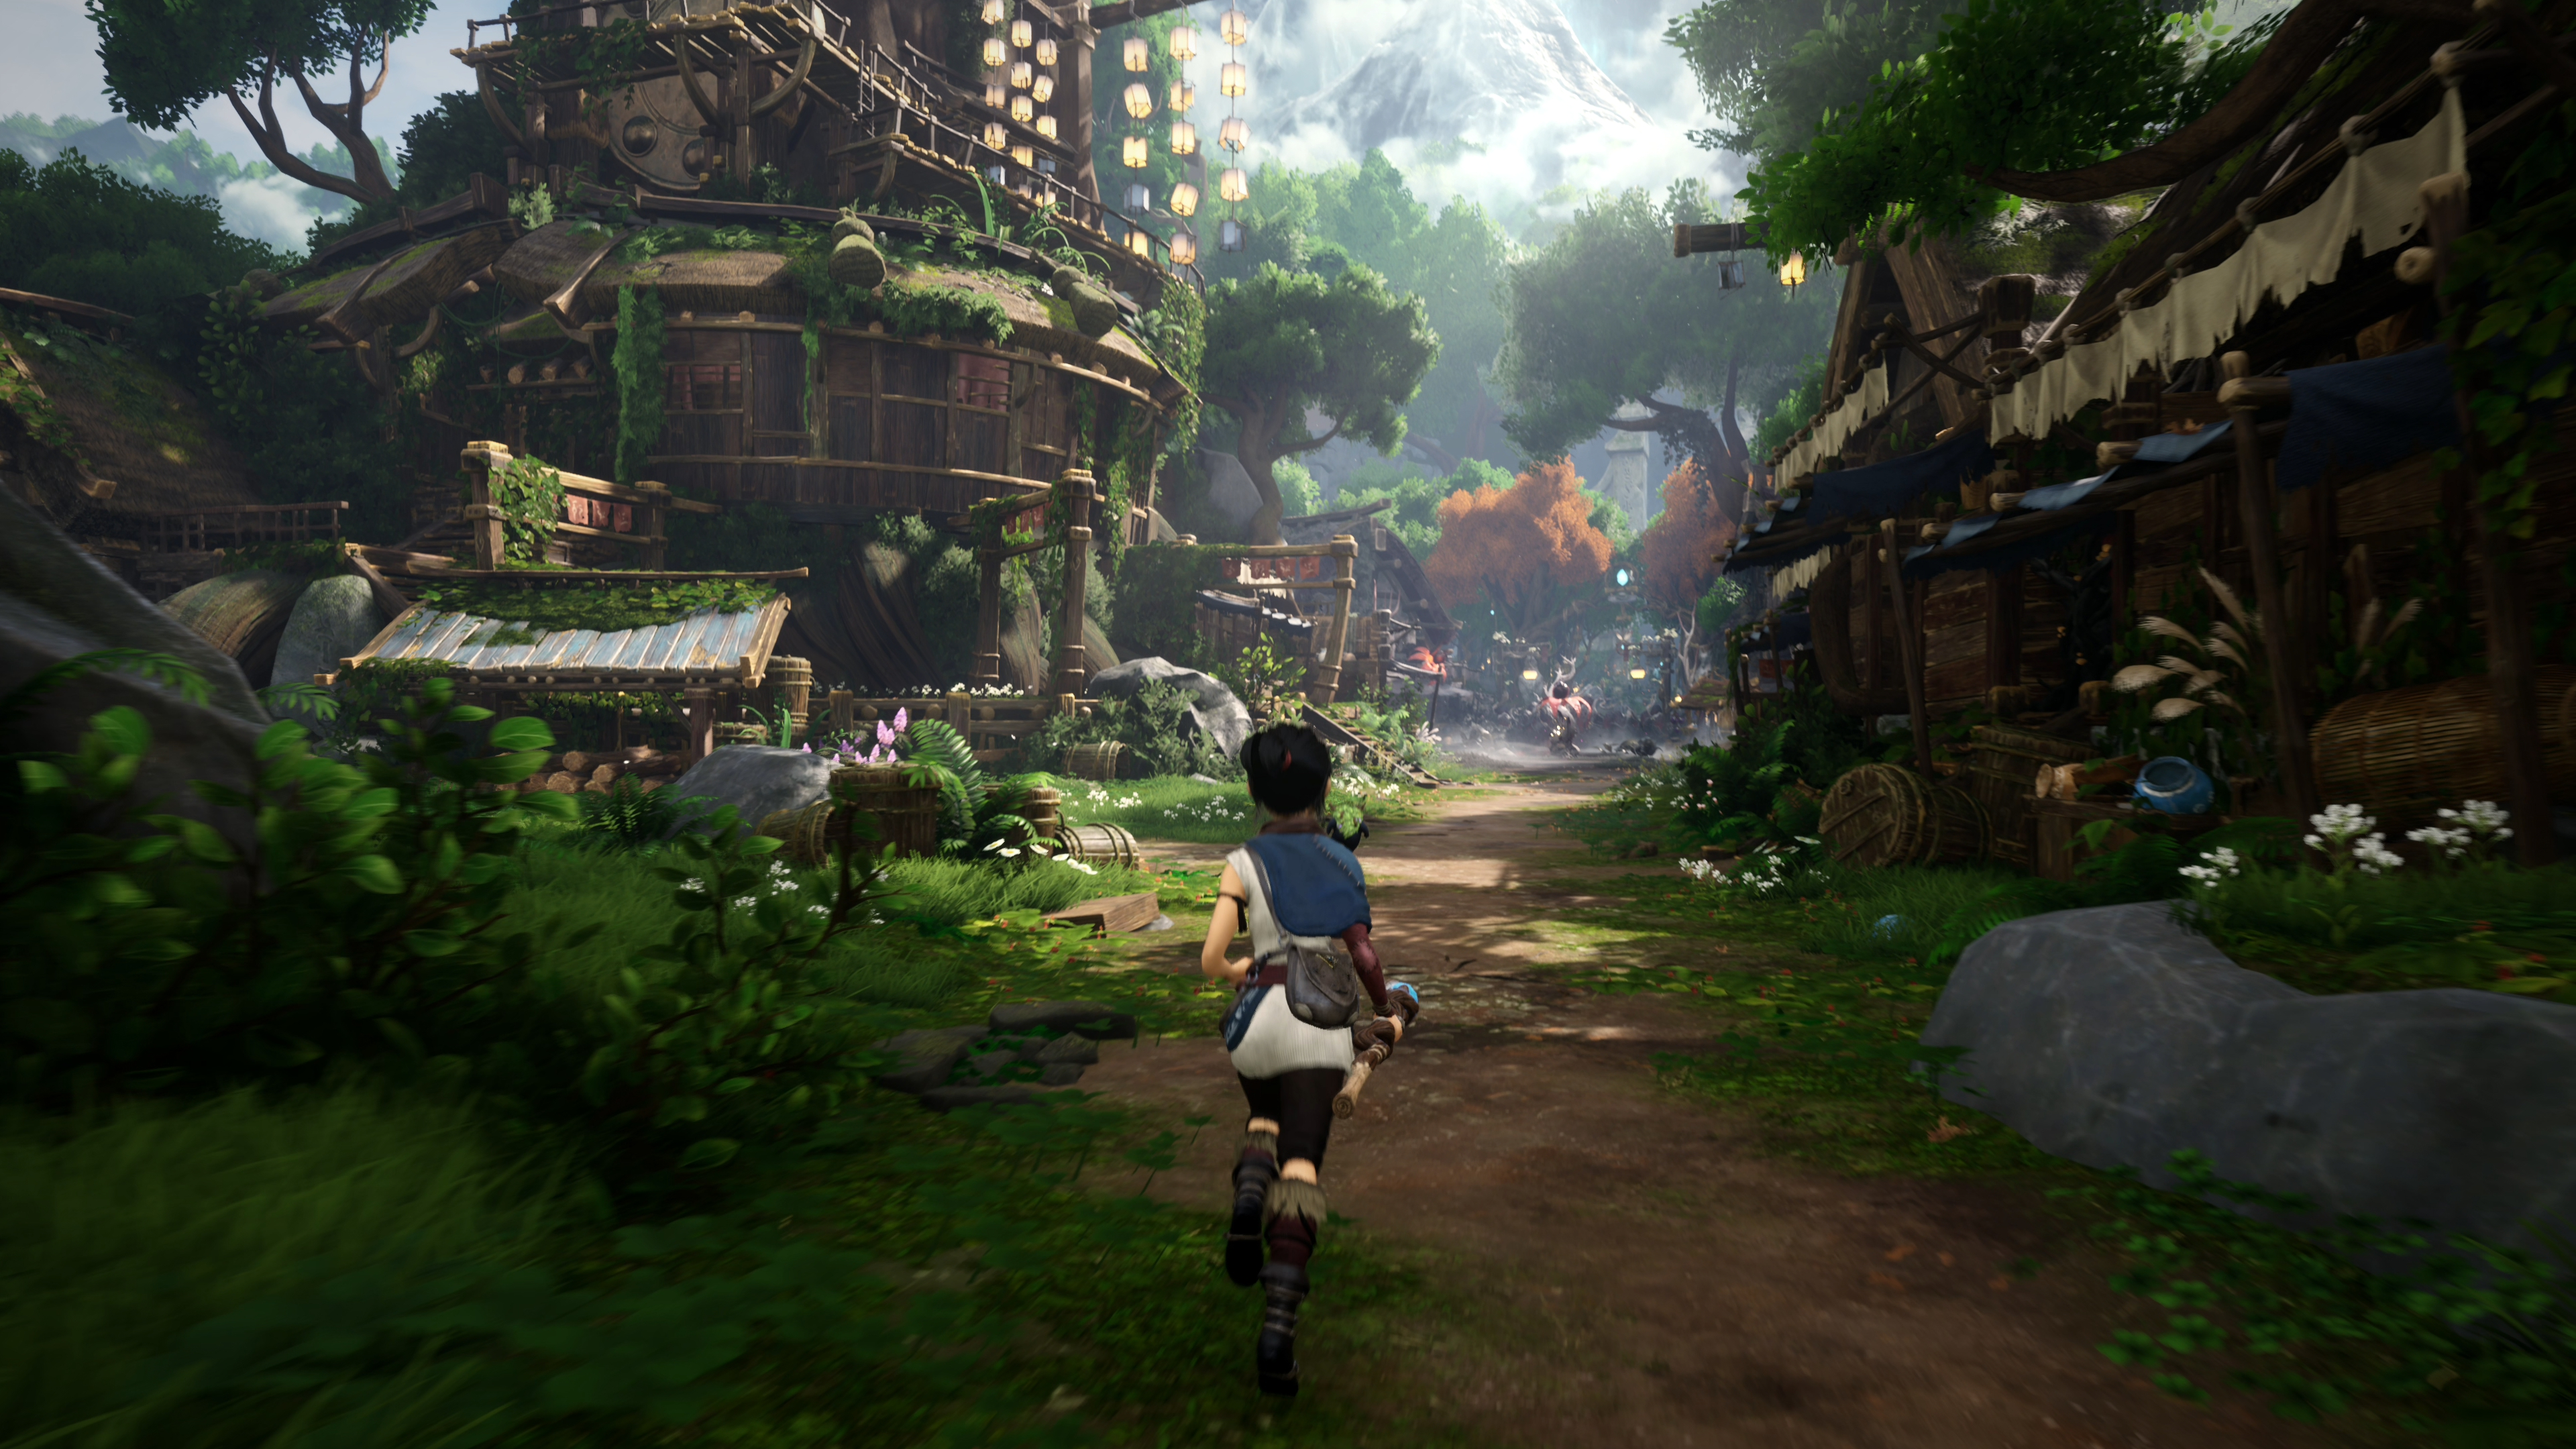 Скриншот №3 к Kena Bridge of Spirits Digital Deluxe PS4 and PS5